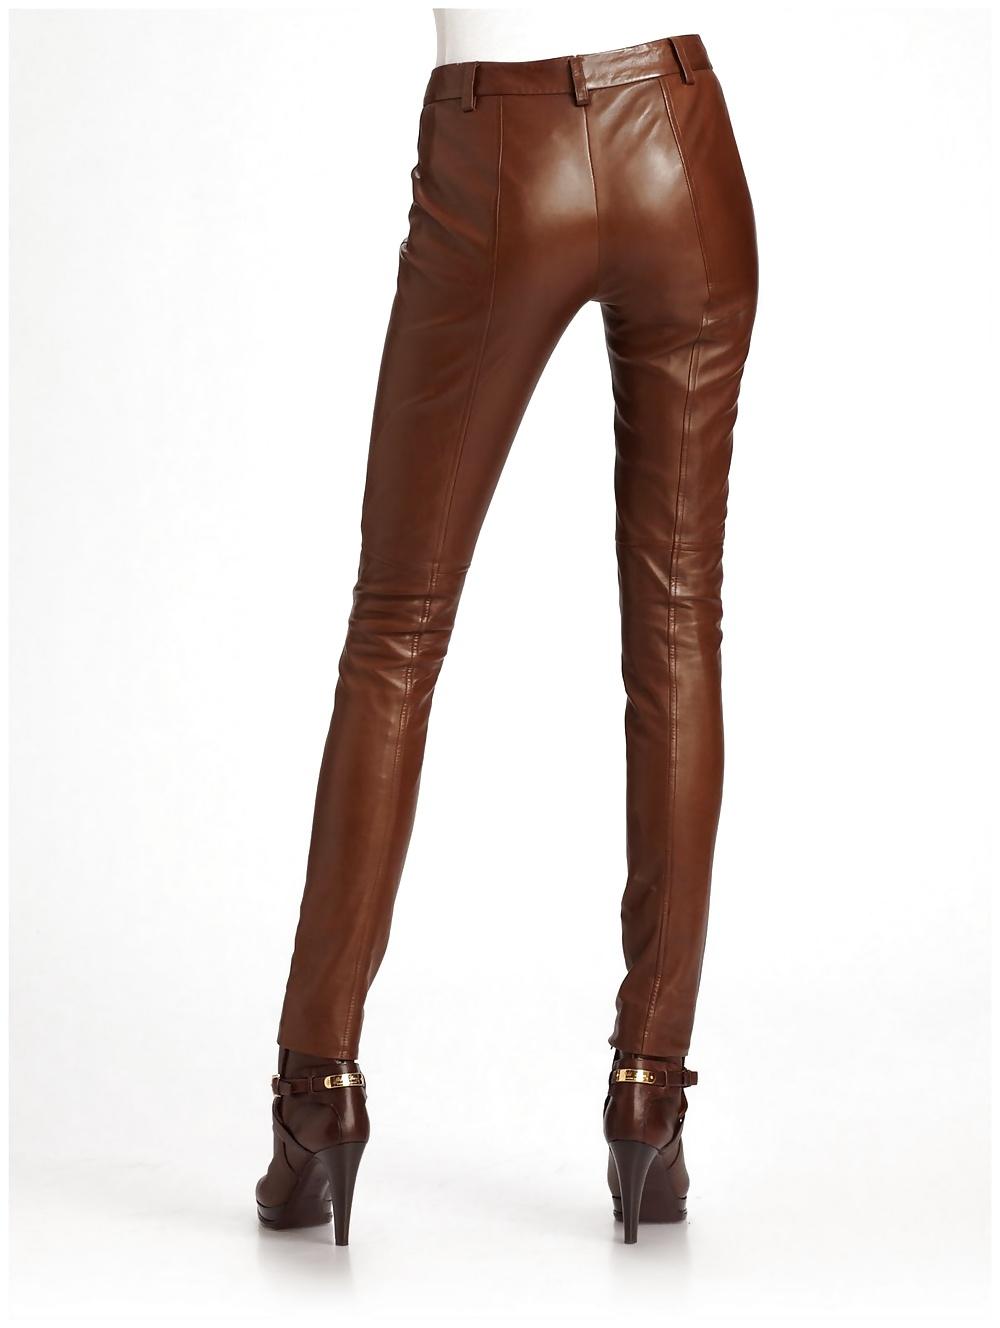 Black leather pants fuck